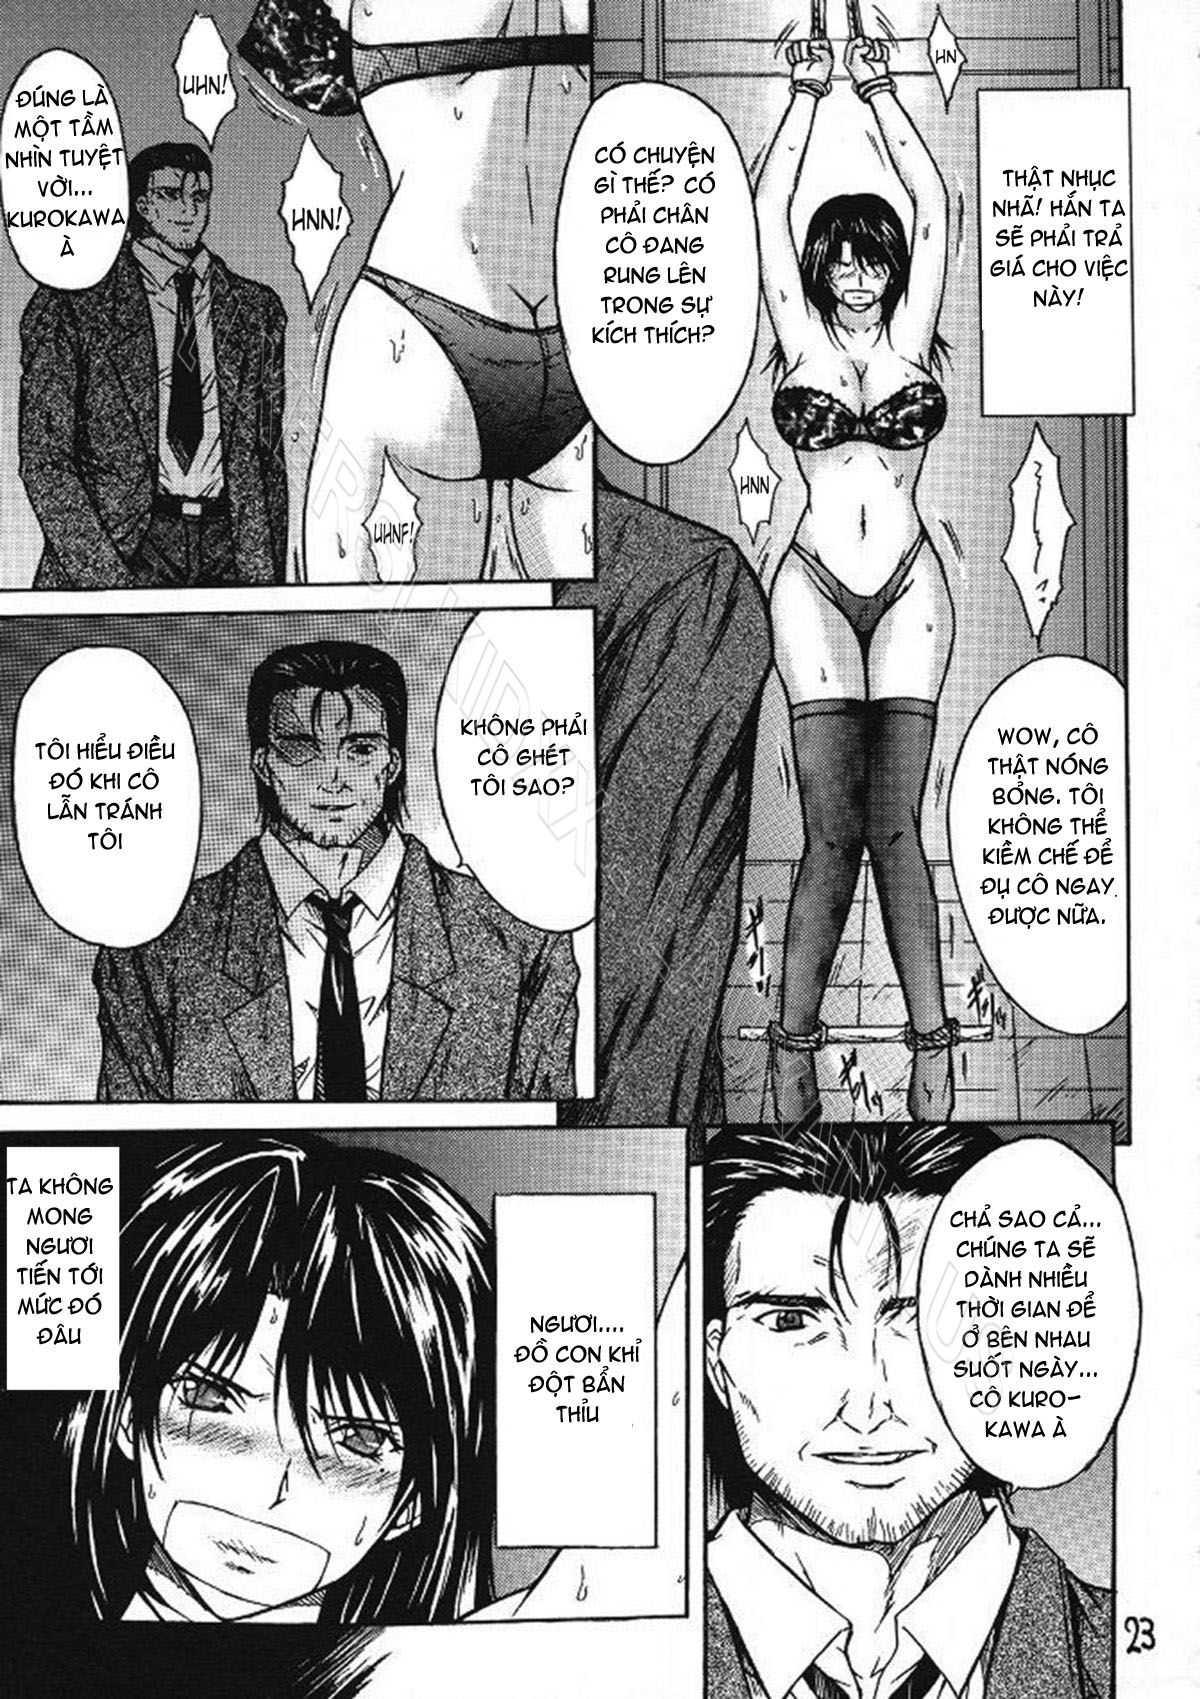 TruyenHay.Com - Ảnh 22 - Ryoujoku Rensa Chapter 2